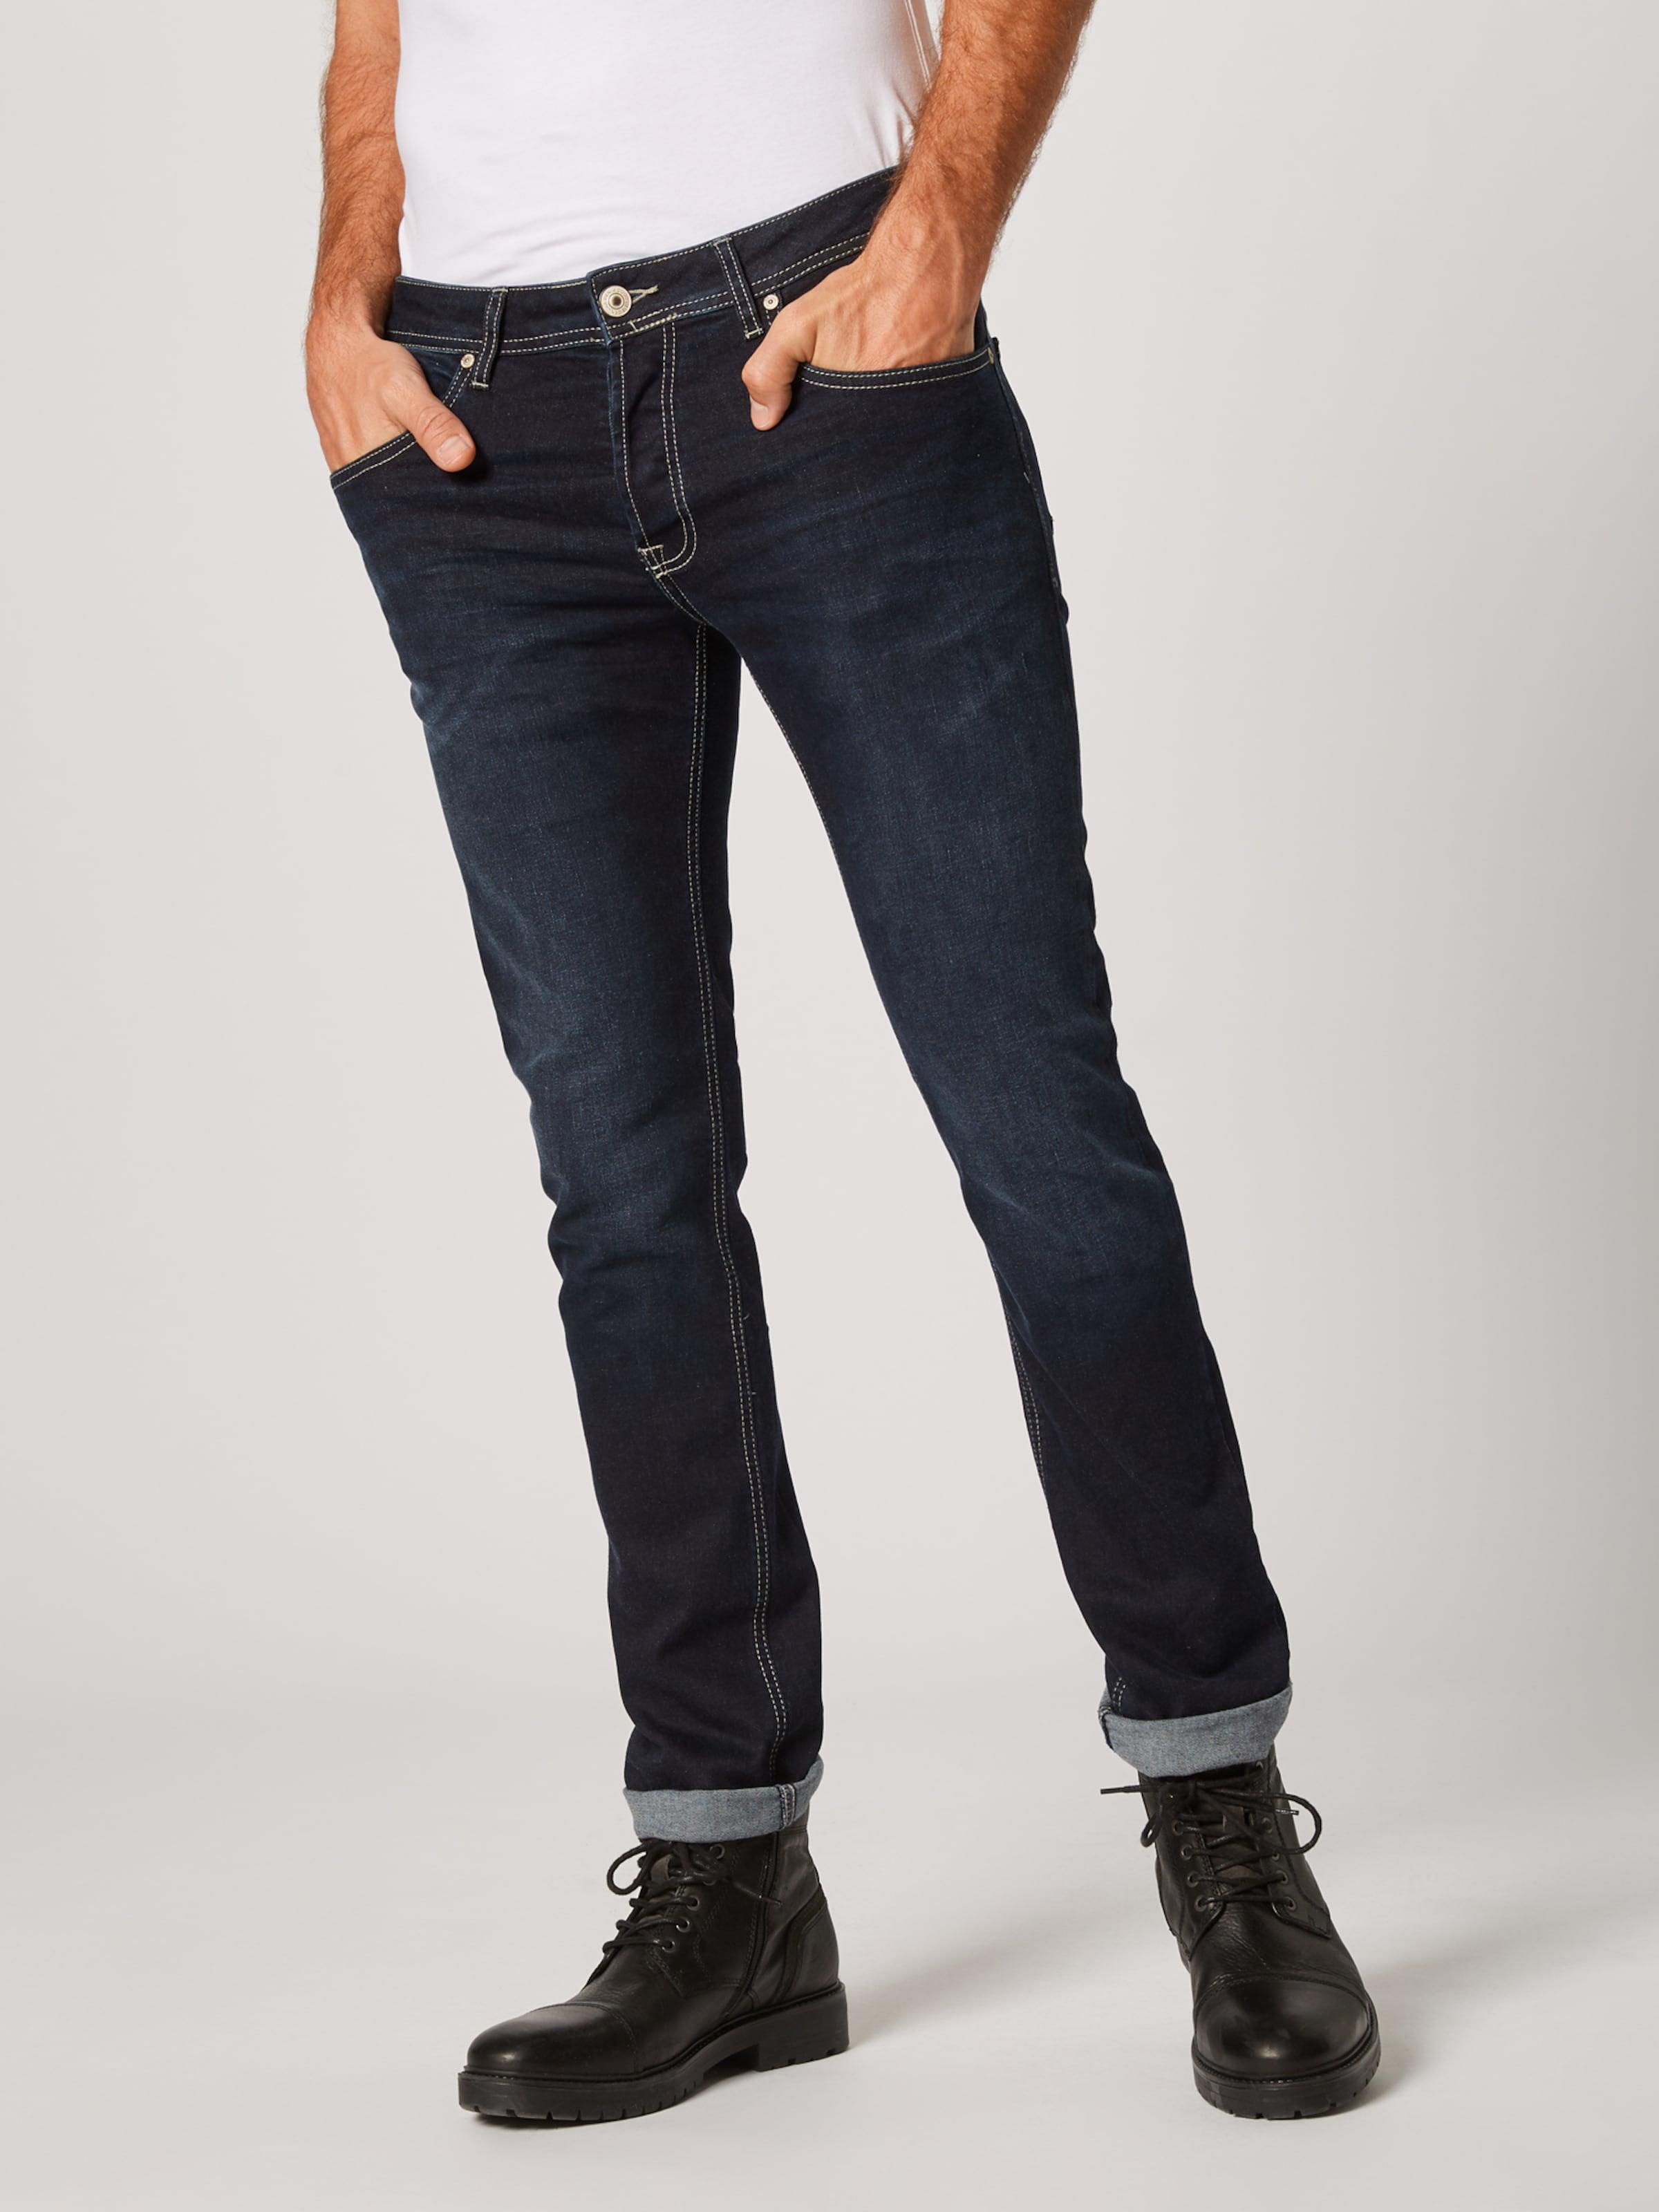 In Jeans D' Blue Denim Ltb 'paul fbYg76yv